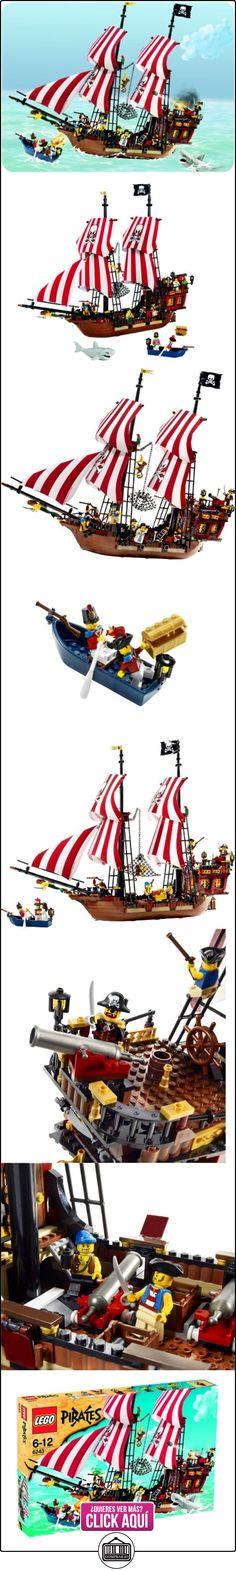 Lego Piraten A Pinterest Collection By Marco Schmidt Lego Stuff